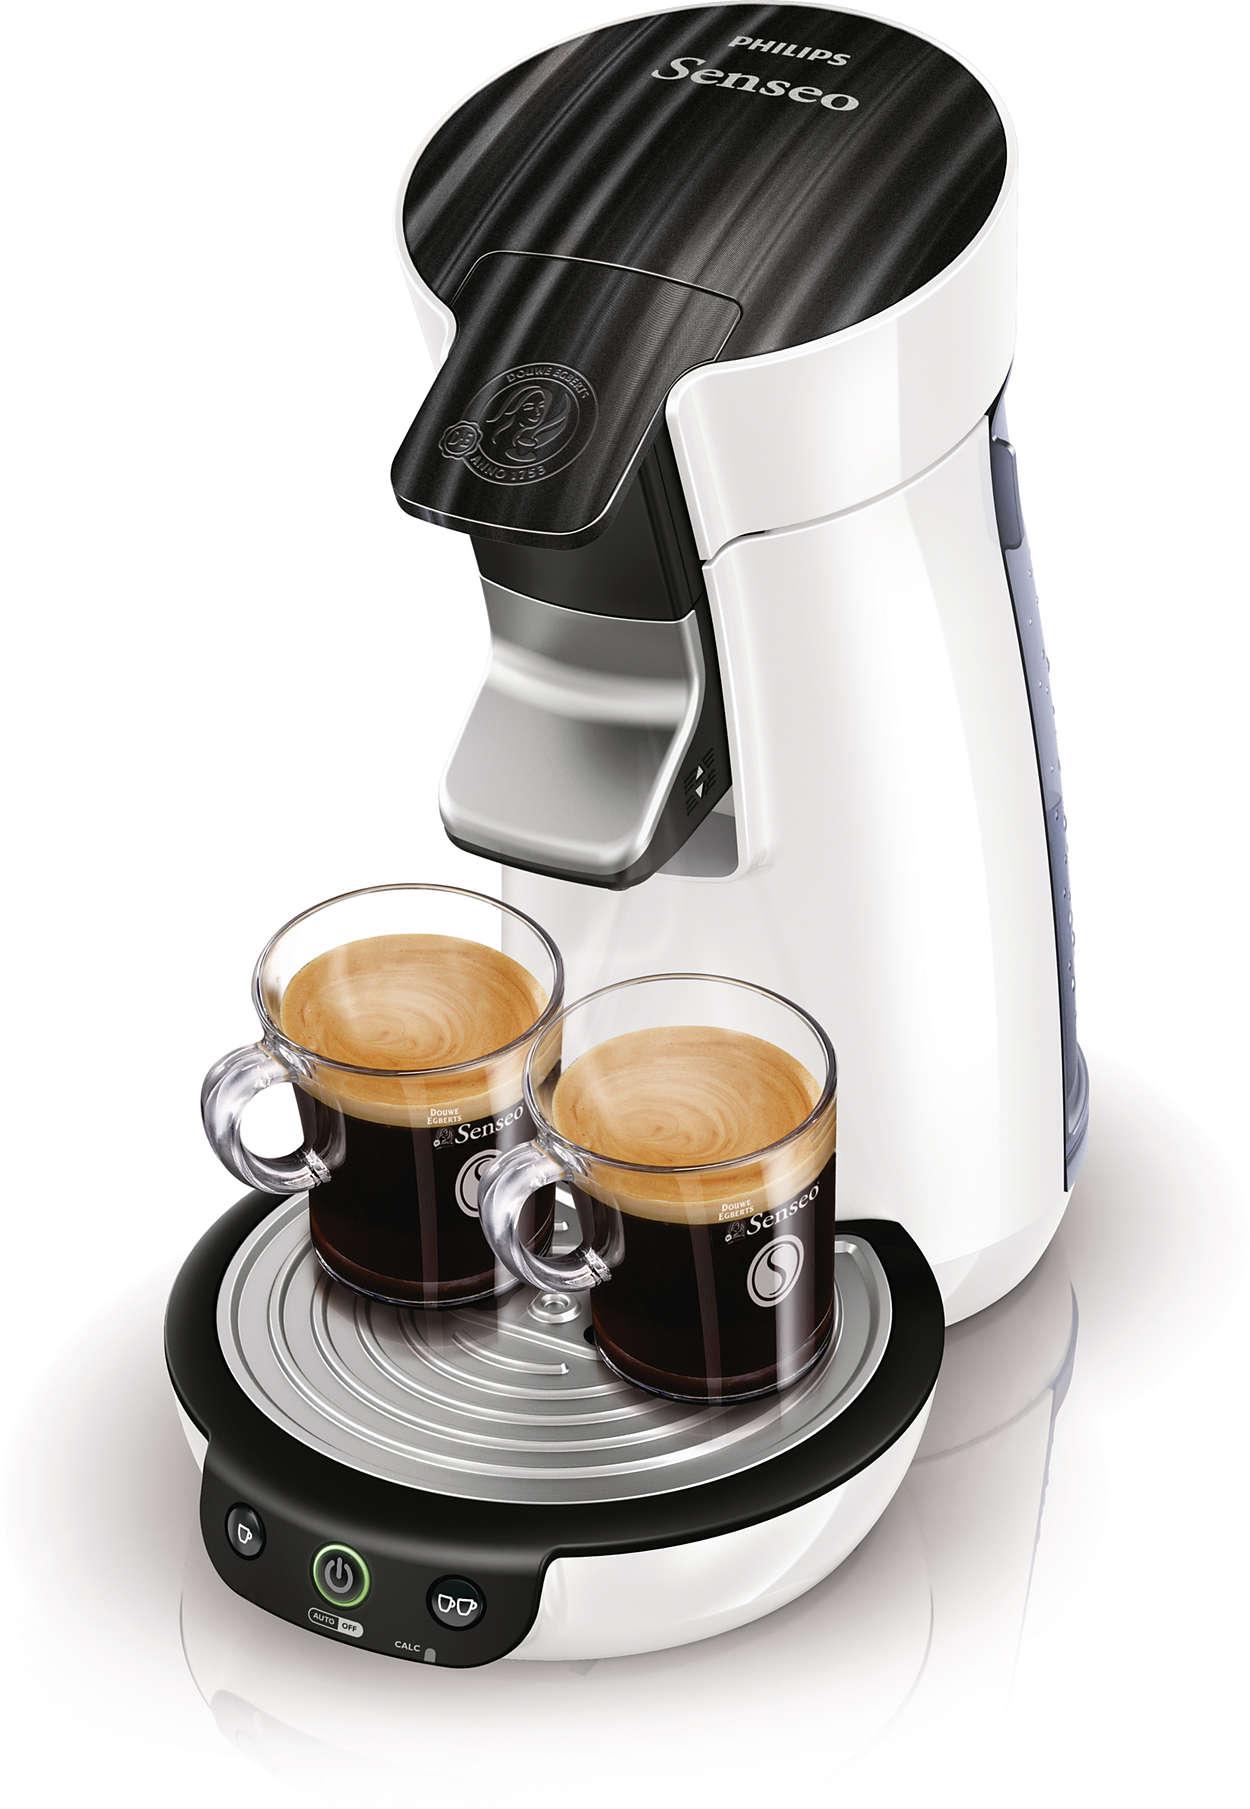 viva caf eco kaffeepadmaschine hd7826 10 senseo. Black Bedroom Furniture Sets. Home Design Ideas